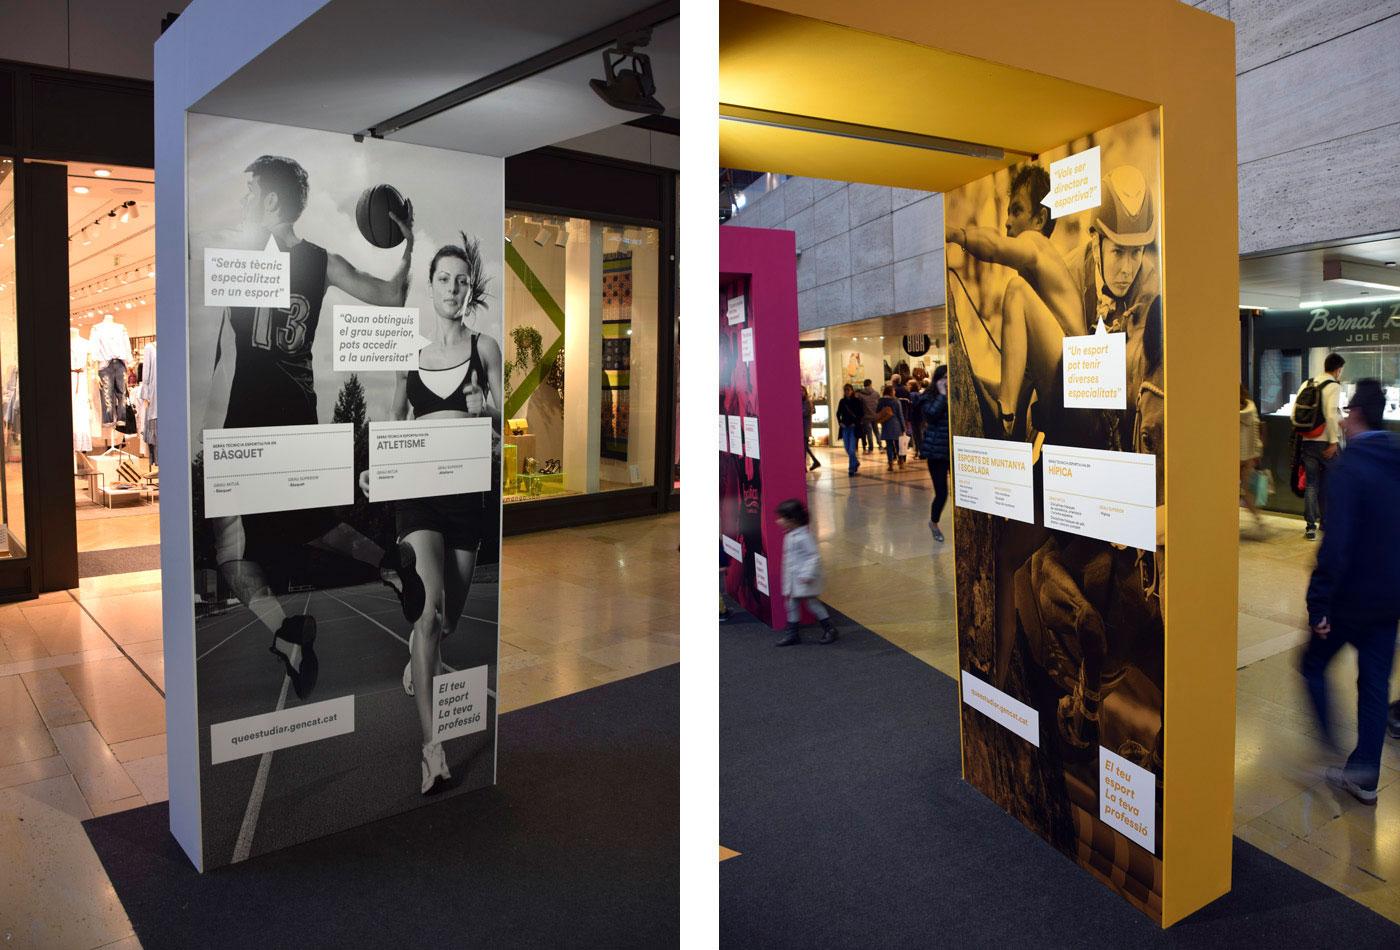 bcn-esport-generalitat-disseny-creartiva-barcelona-expo-ensenyament-illa-diagonal